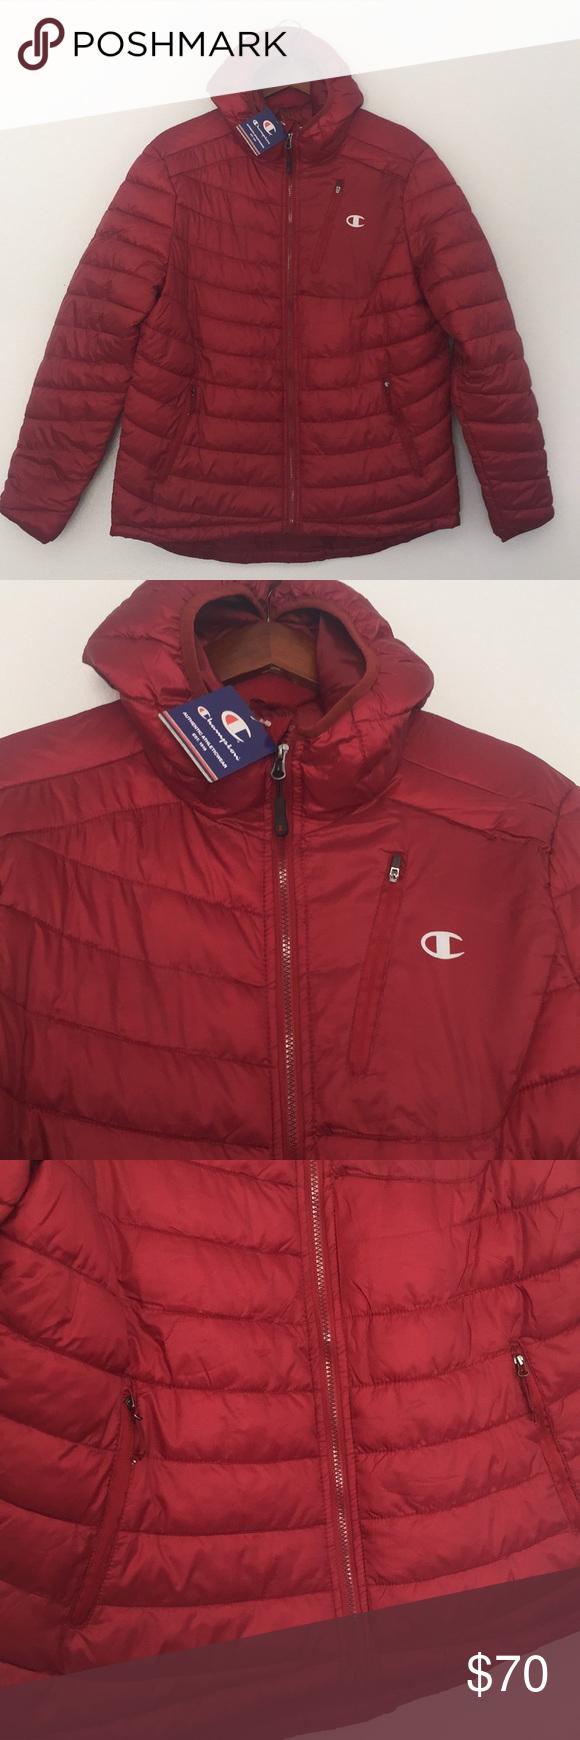 Champion Puffer Jacket Fashion Clothes Design Fashion Design [ 1740 x 580 Pixel ]